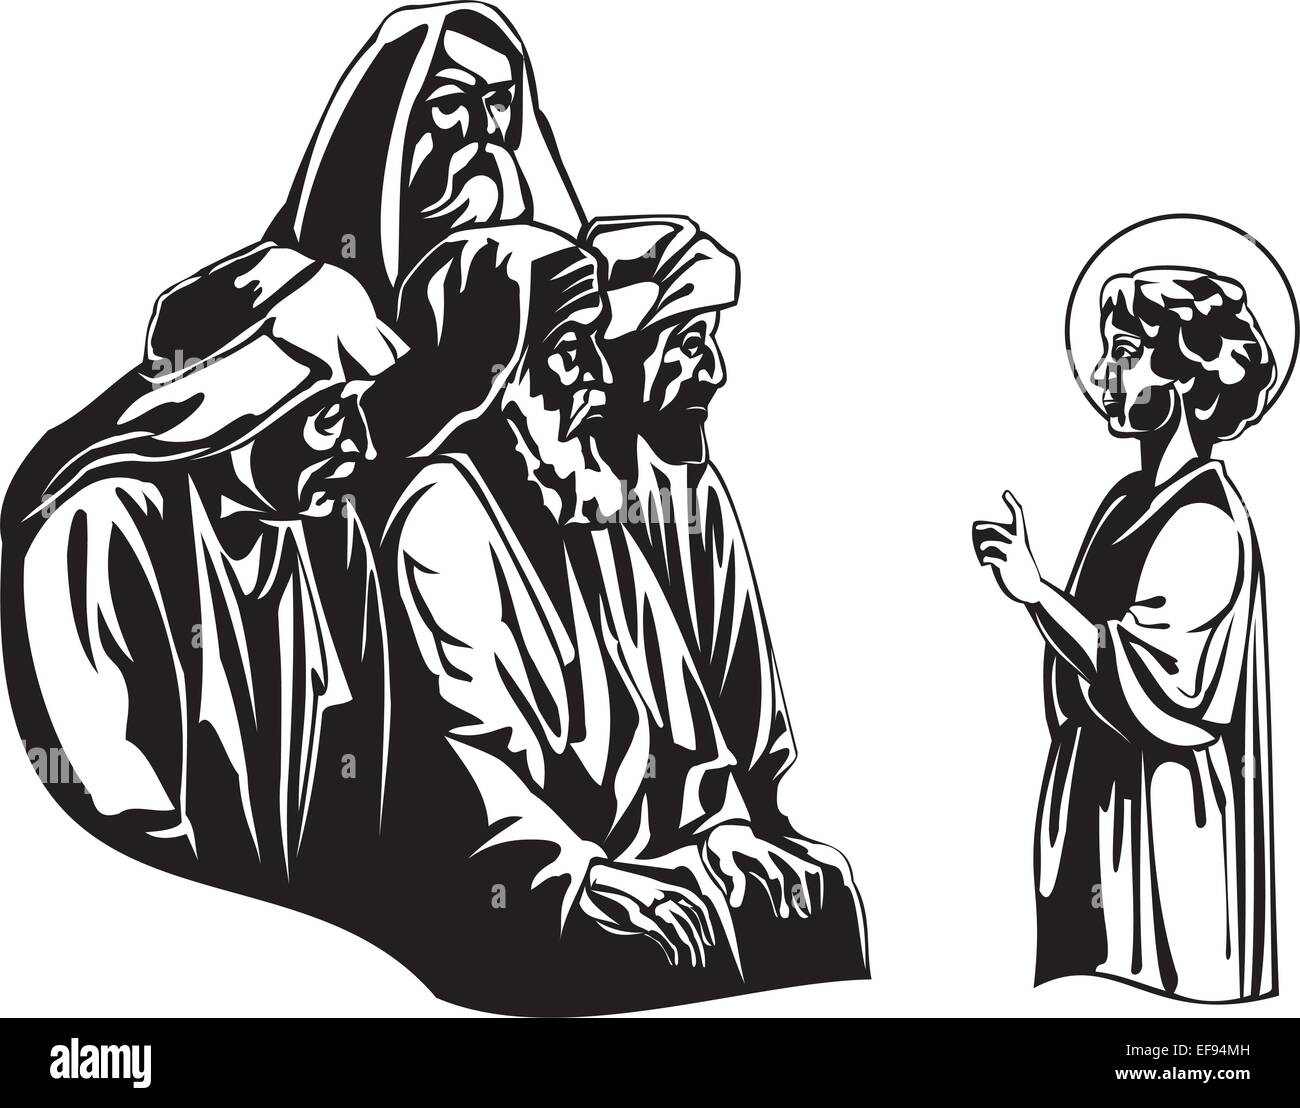 Jesus Teaching Rabbis - Stock Vector